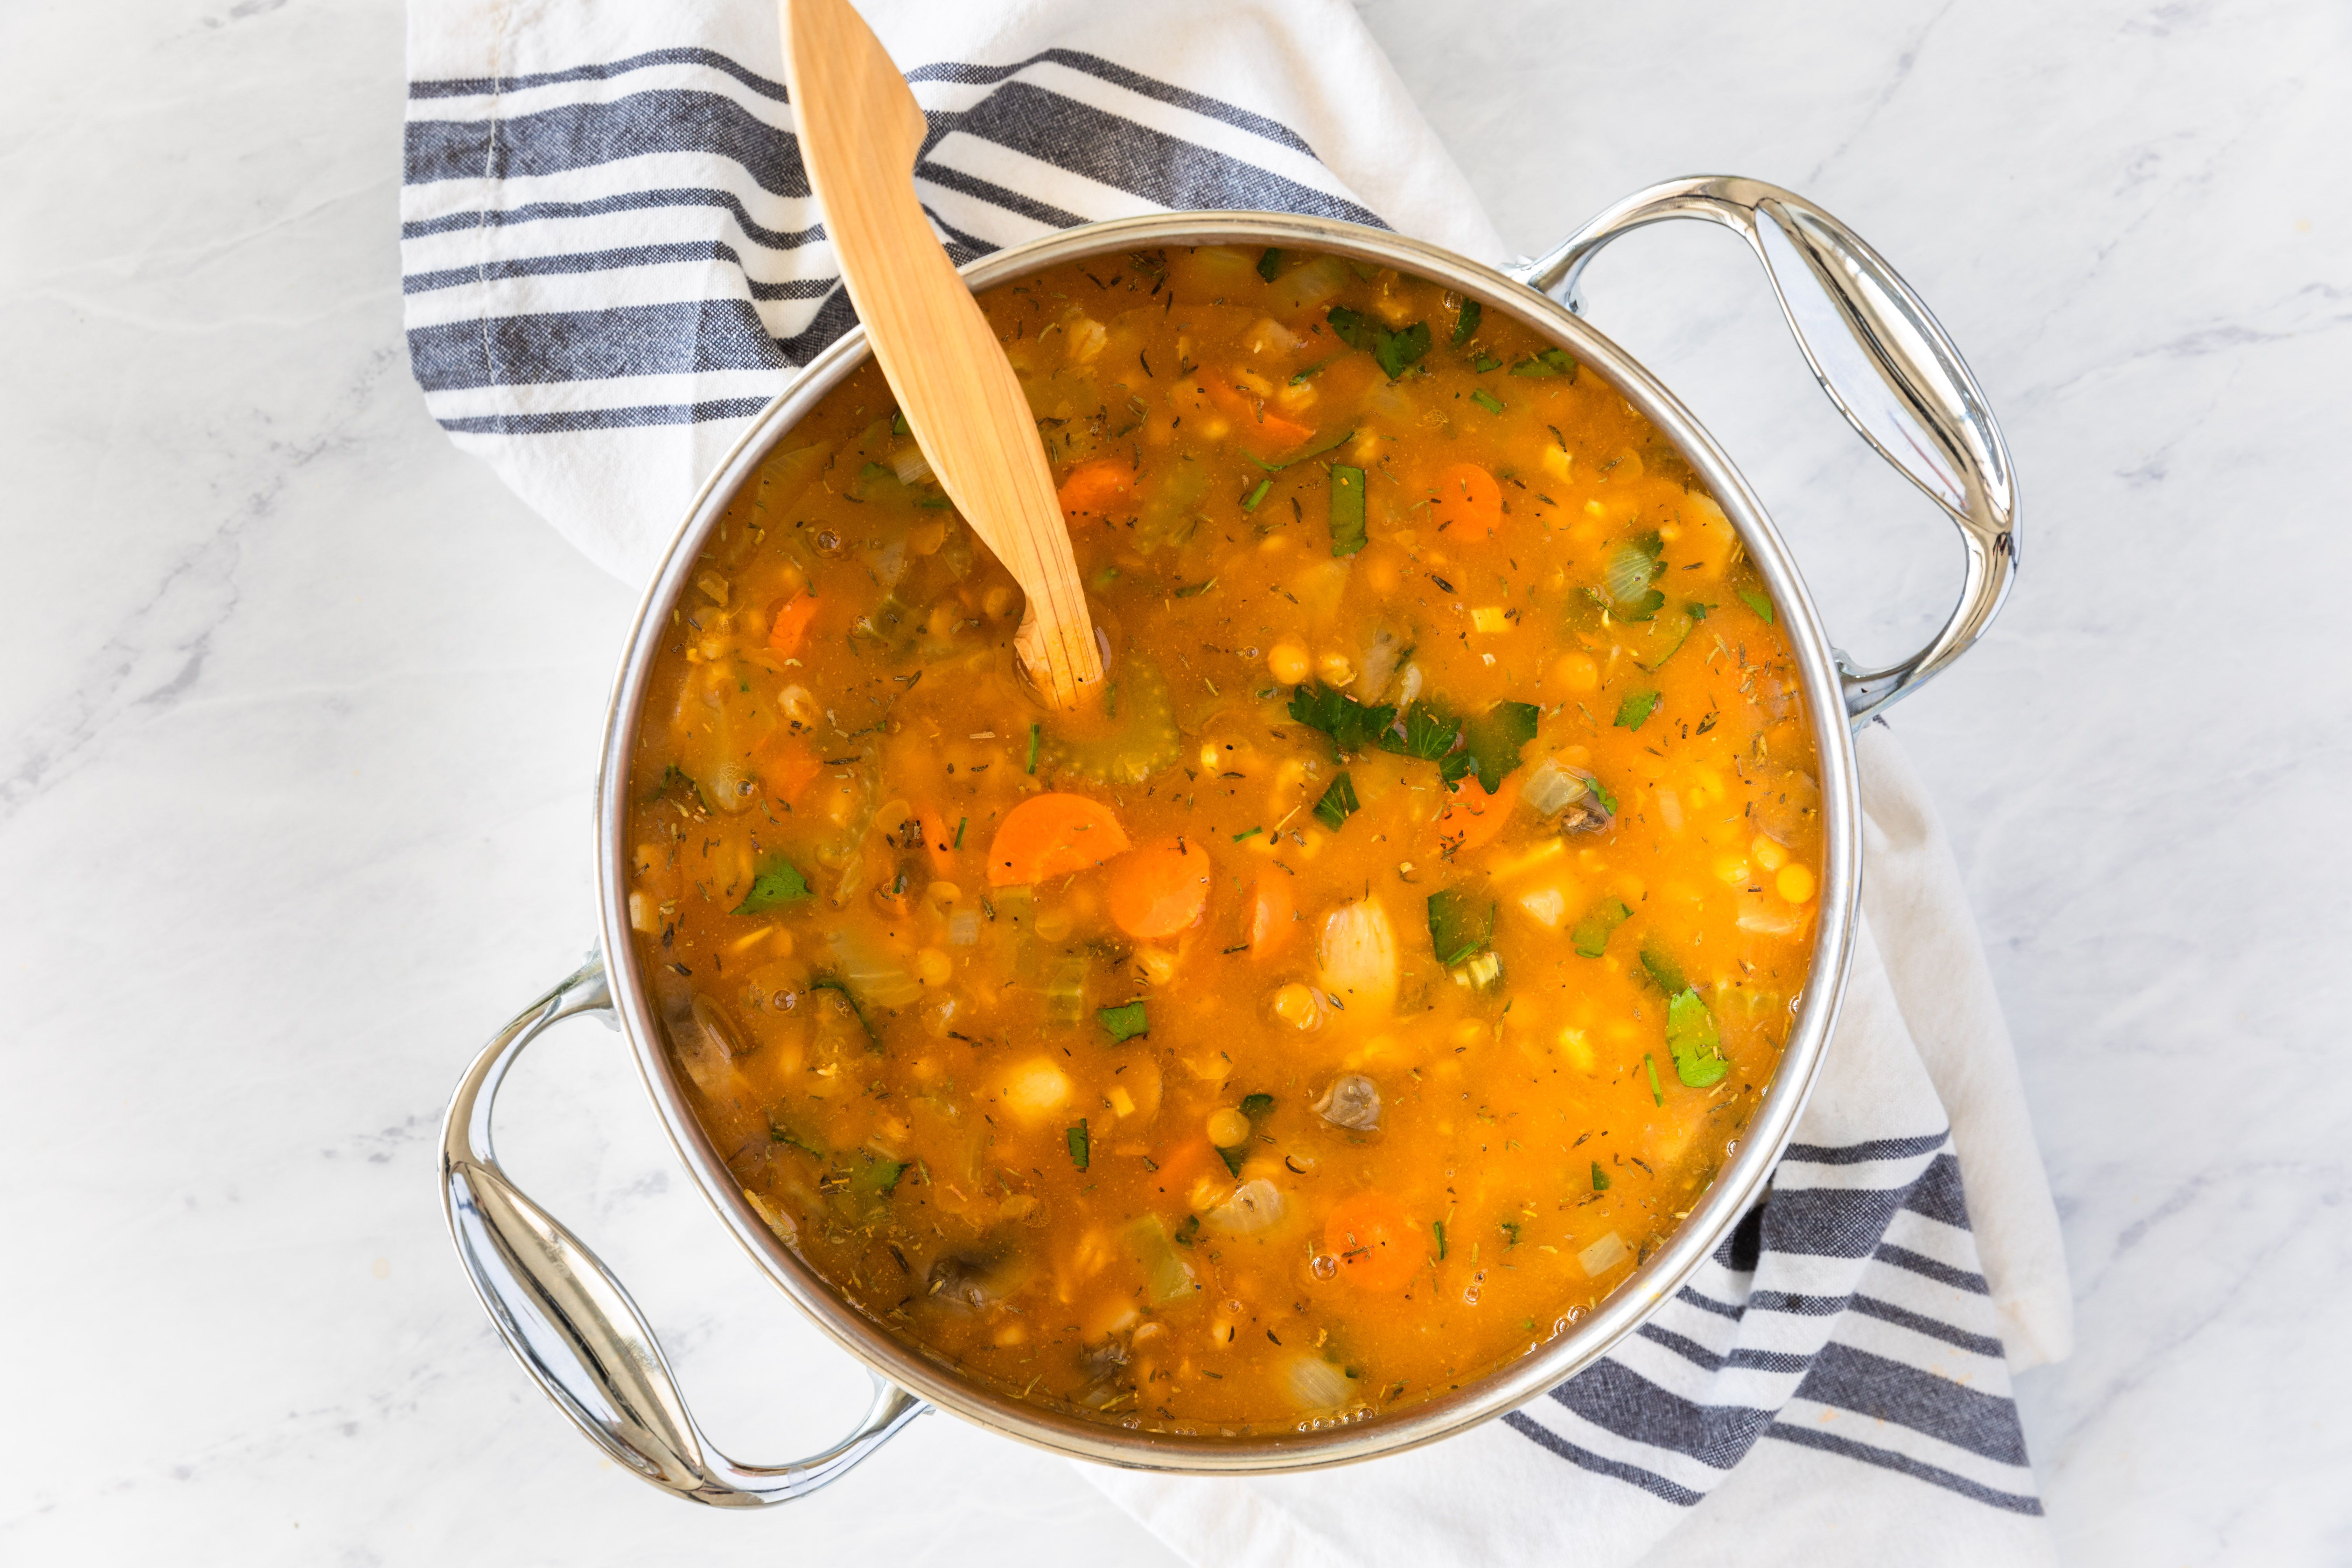 Barley vegetable soup with lentils in saucepan